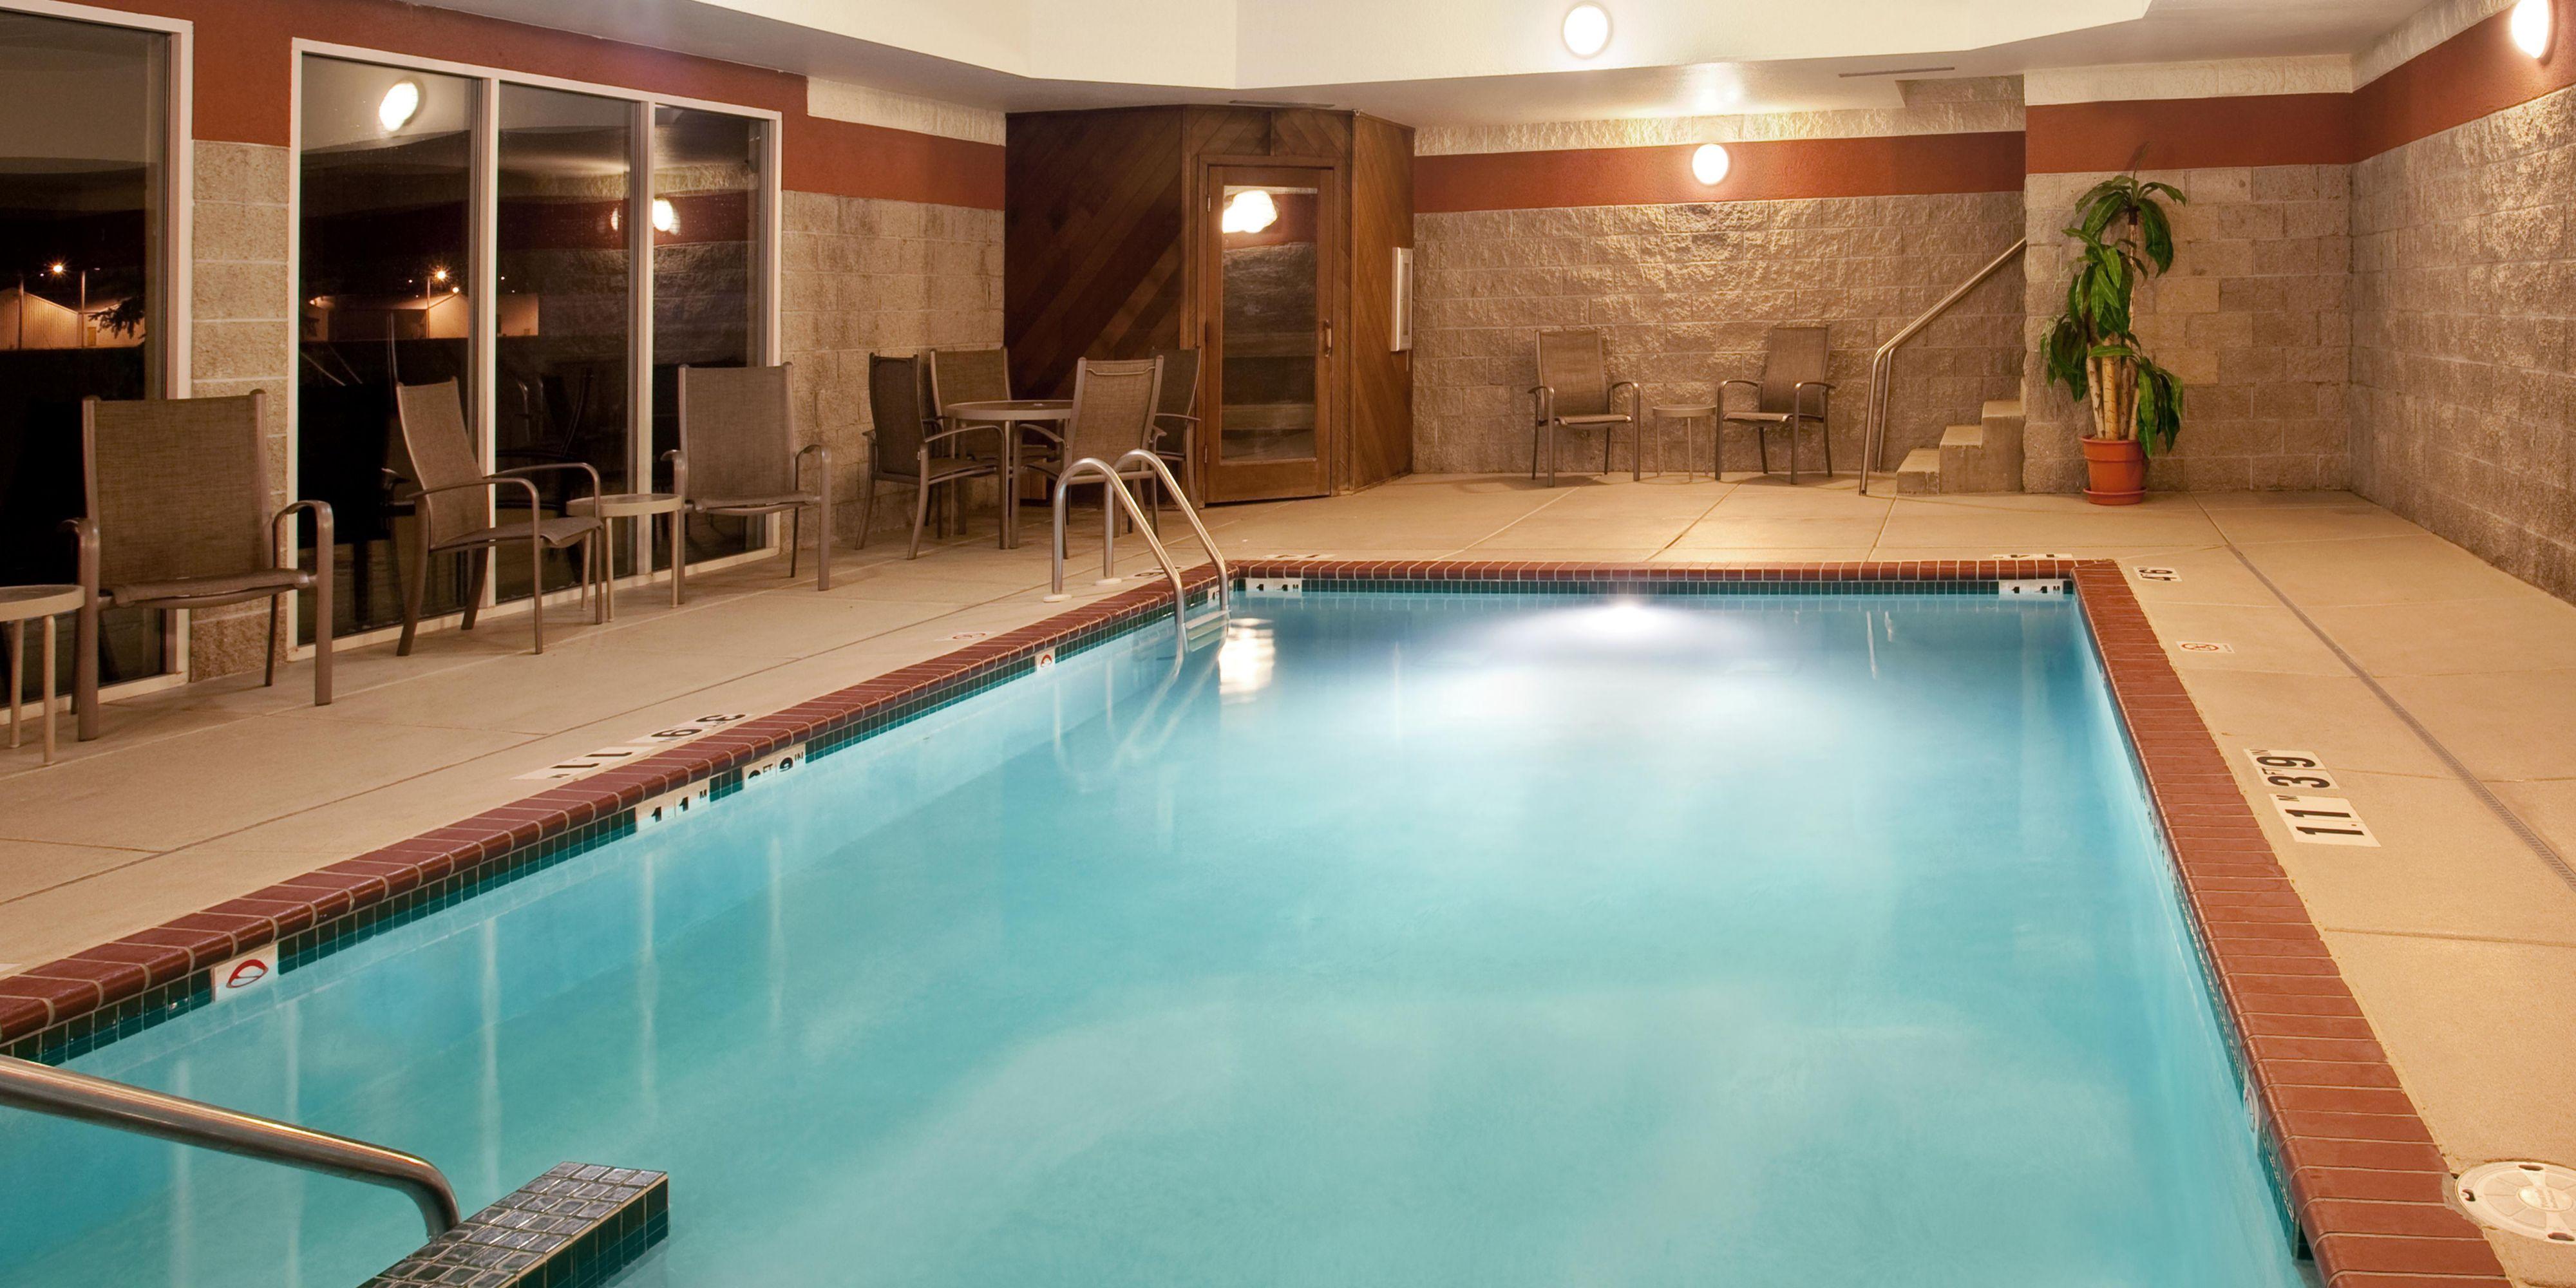 Holiday Inn Express Watertown 2533104304 2x1